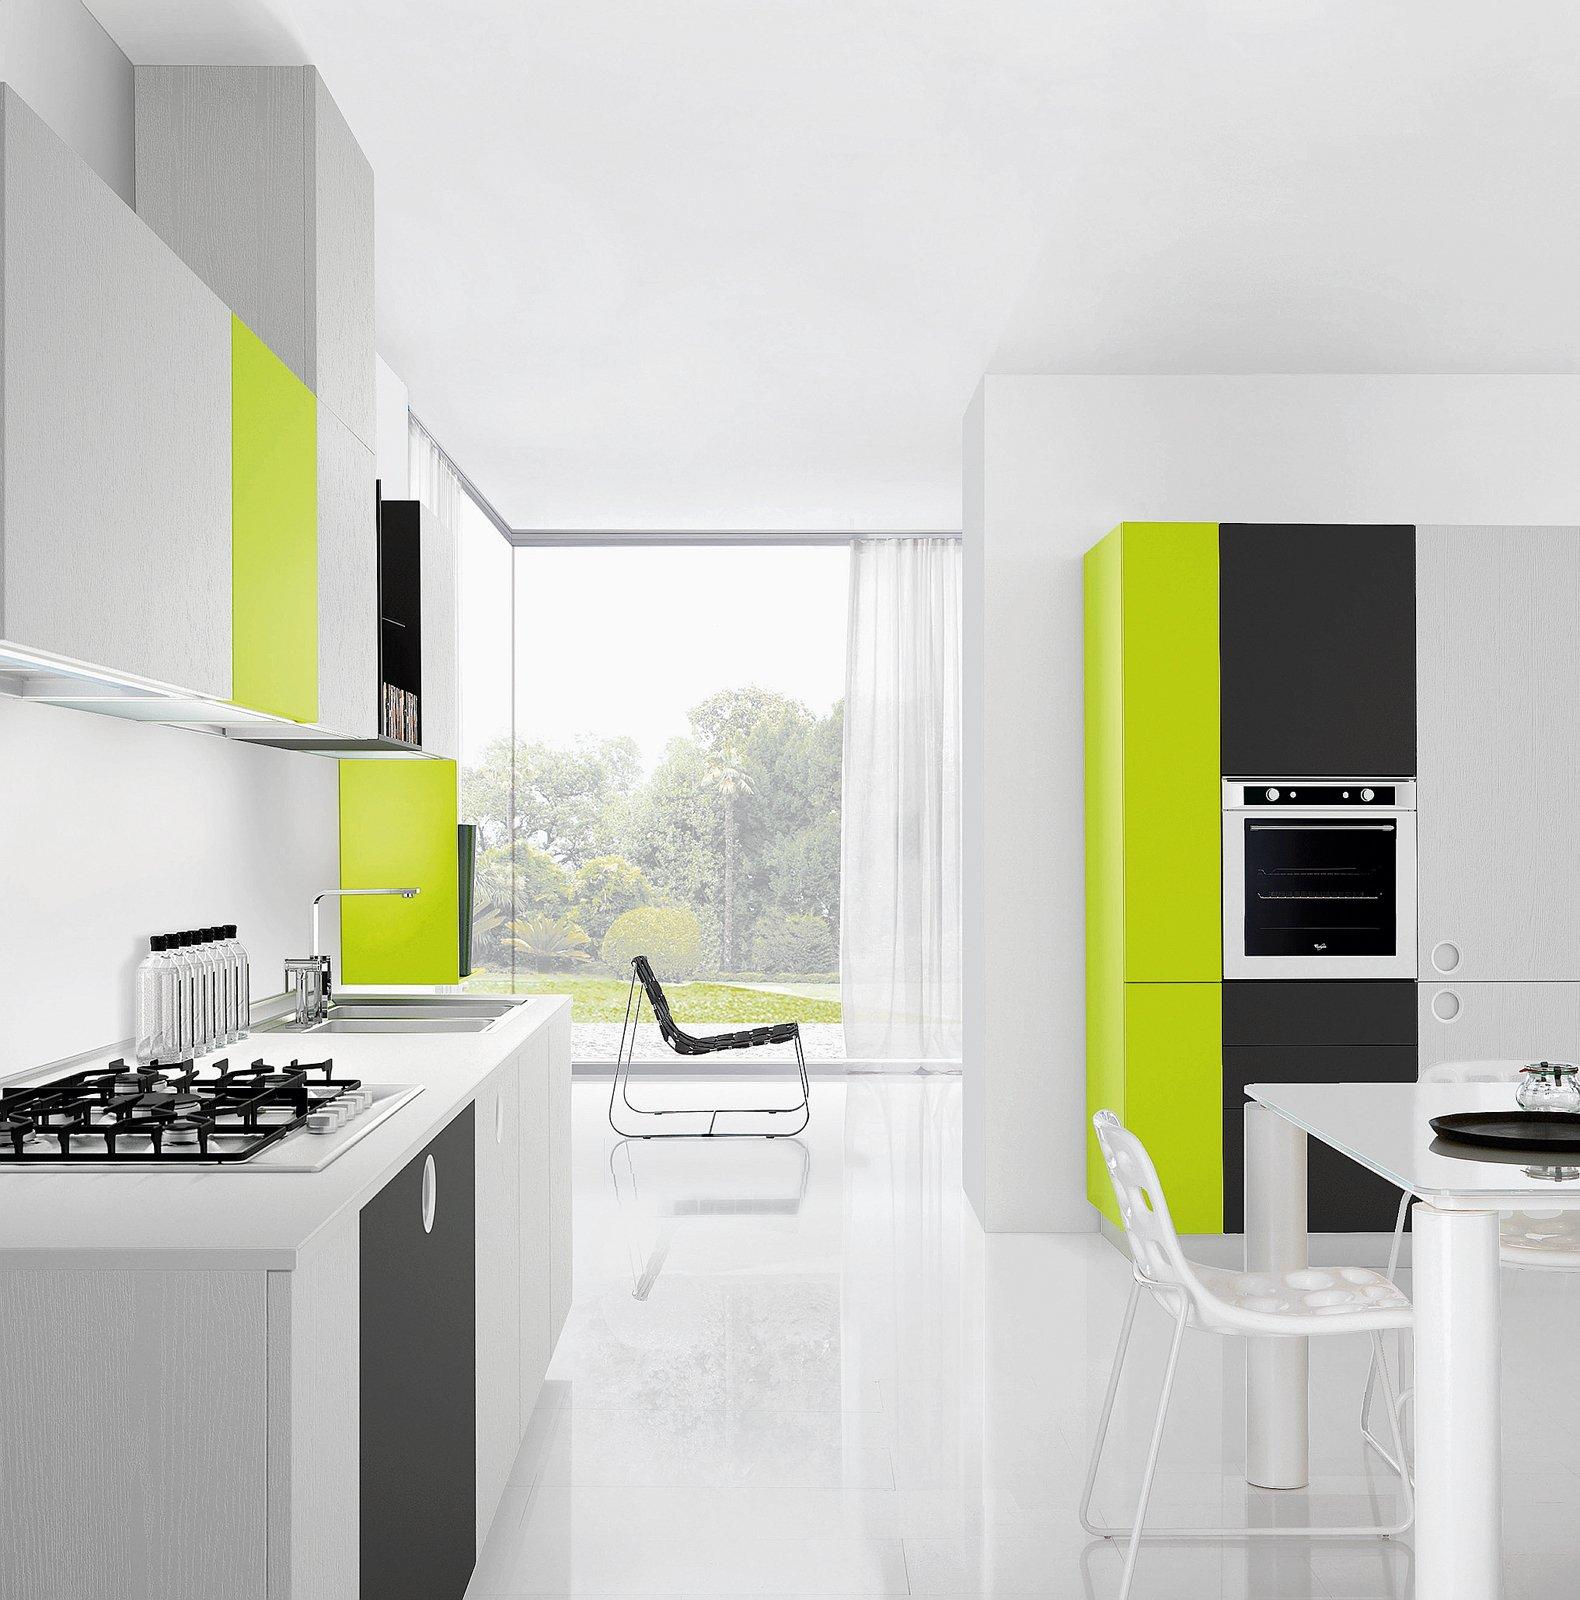 La cucina colorata un guizzo di vitalit cose di casa - Cucina per casa ...